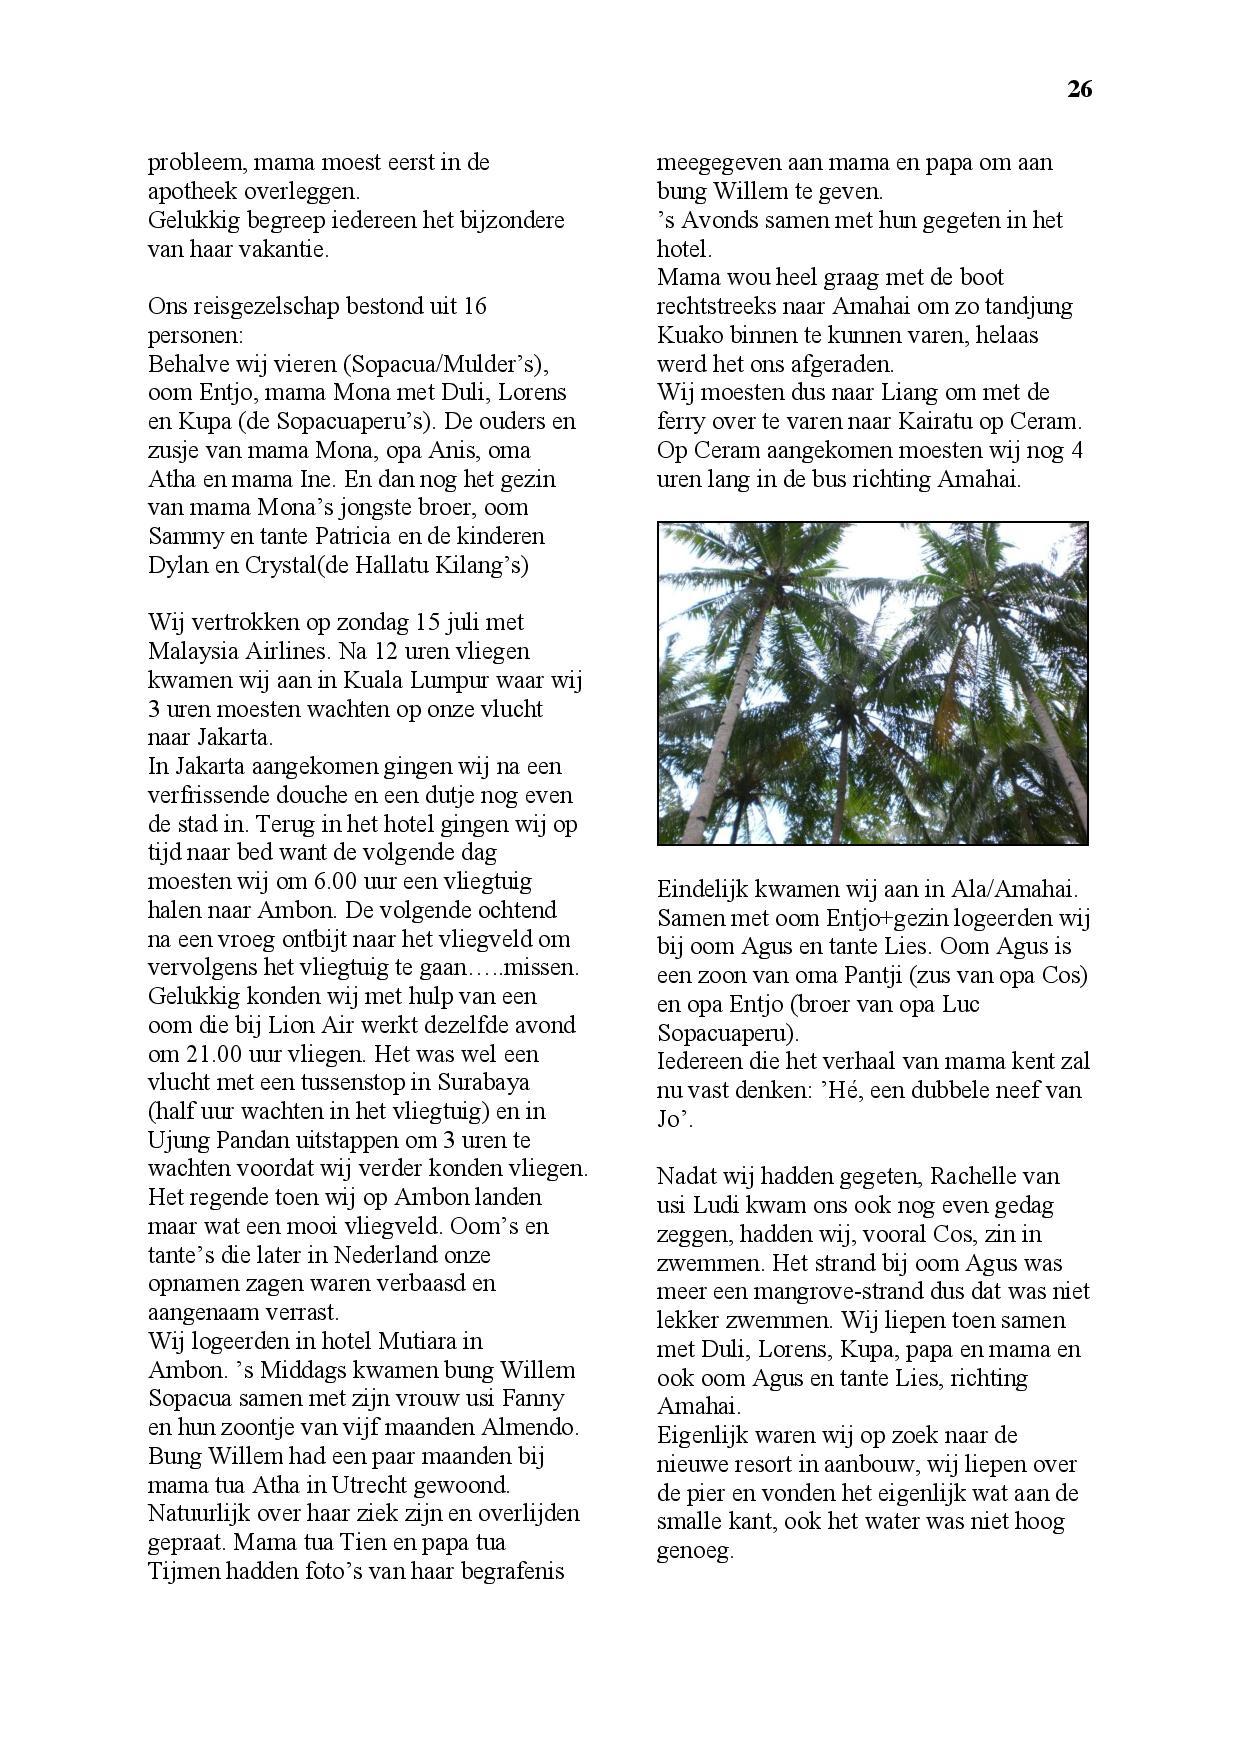 Saka Mese 3e jaargang nr. 02-2007 definitieve webversie-page-026